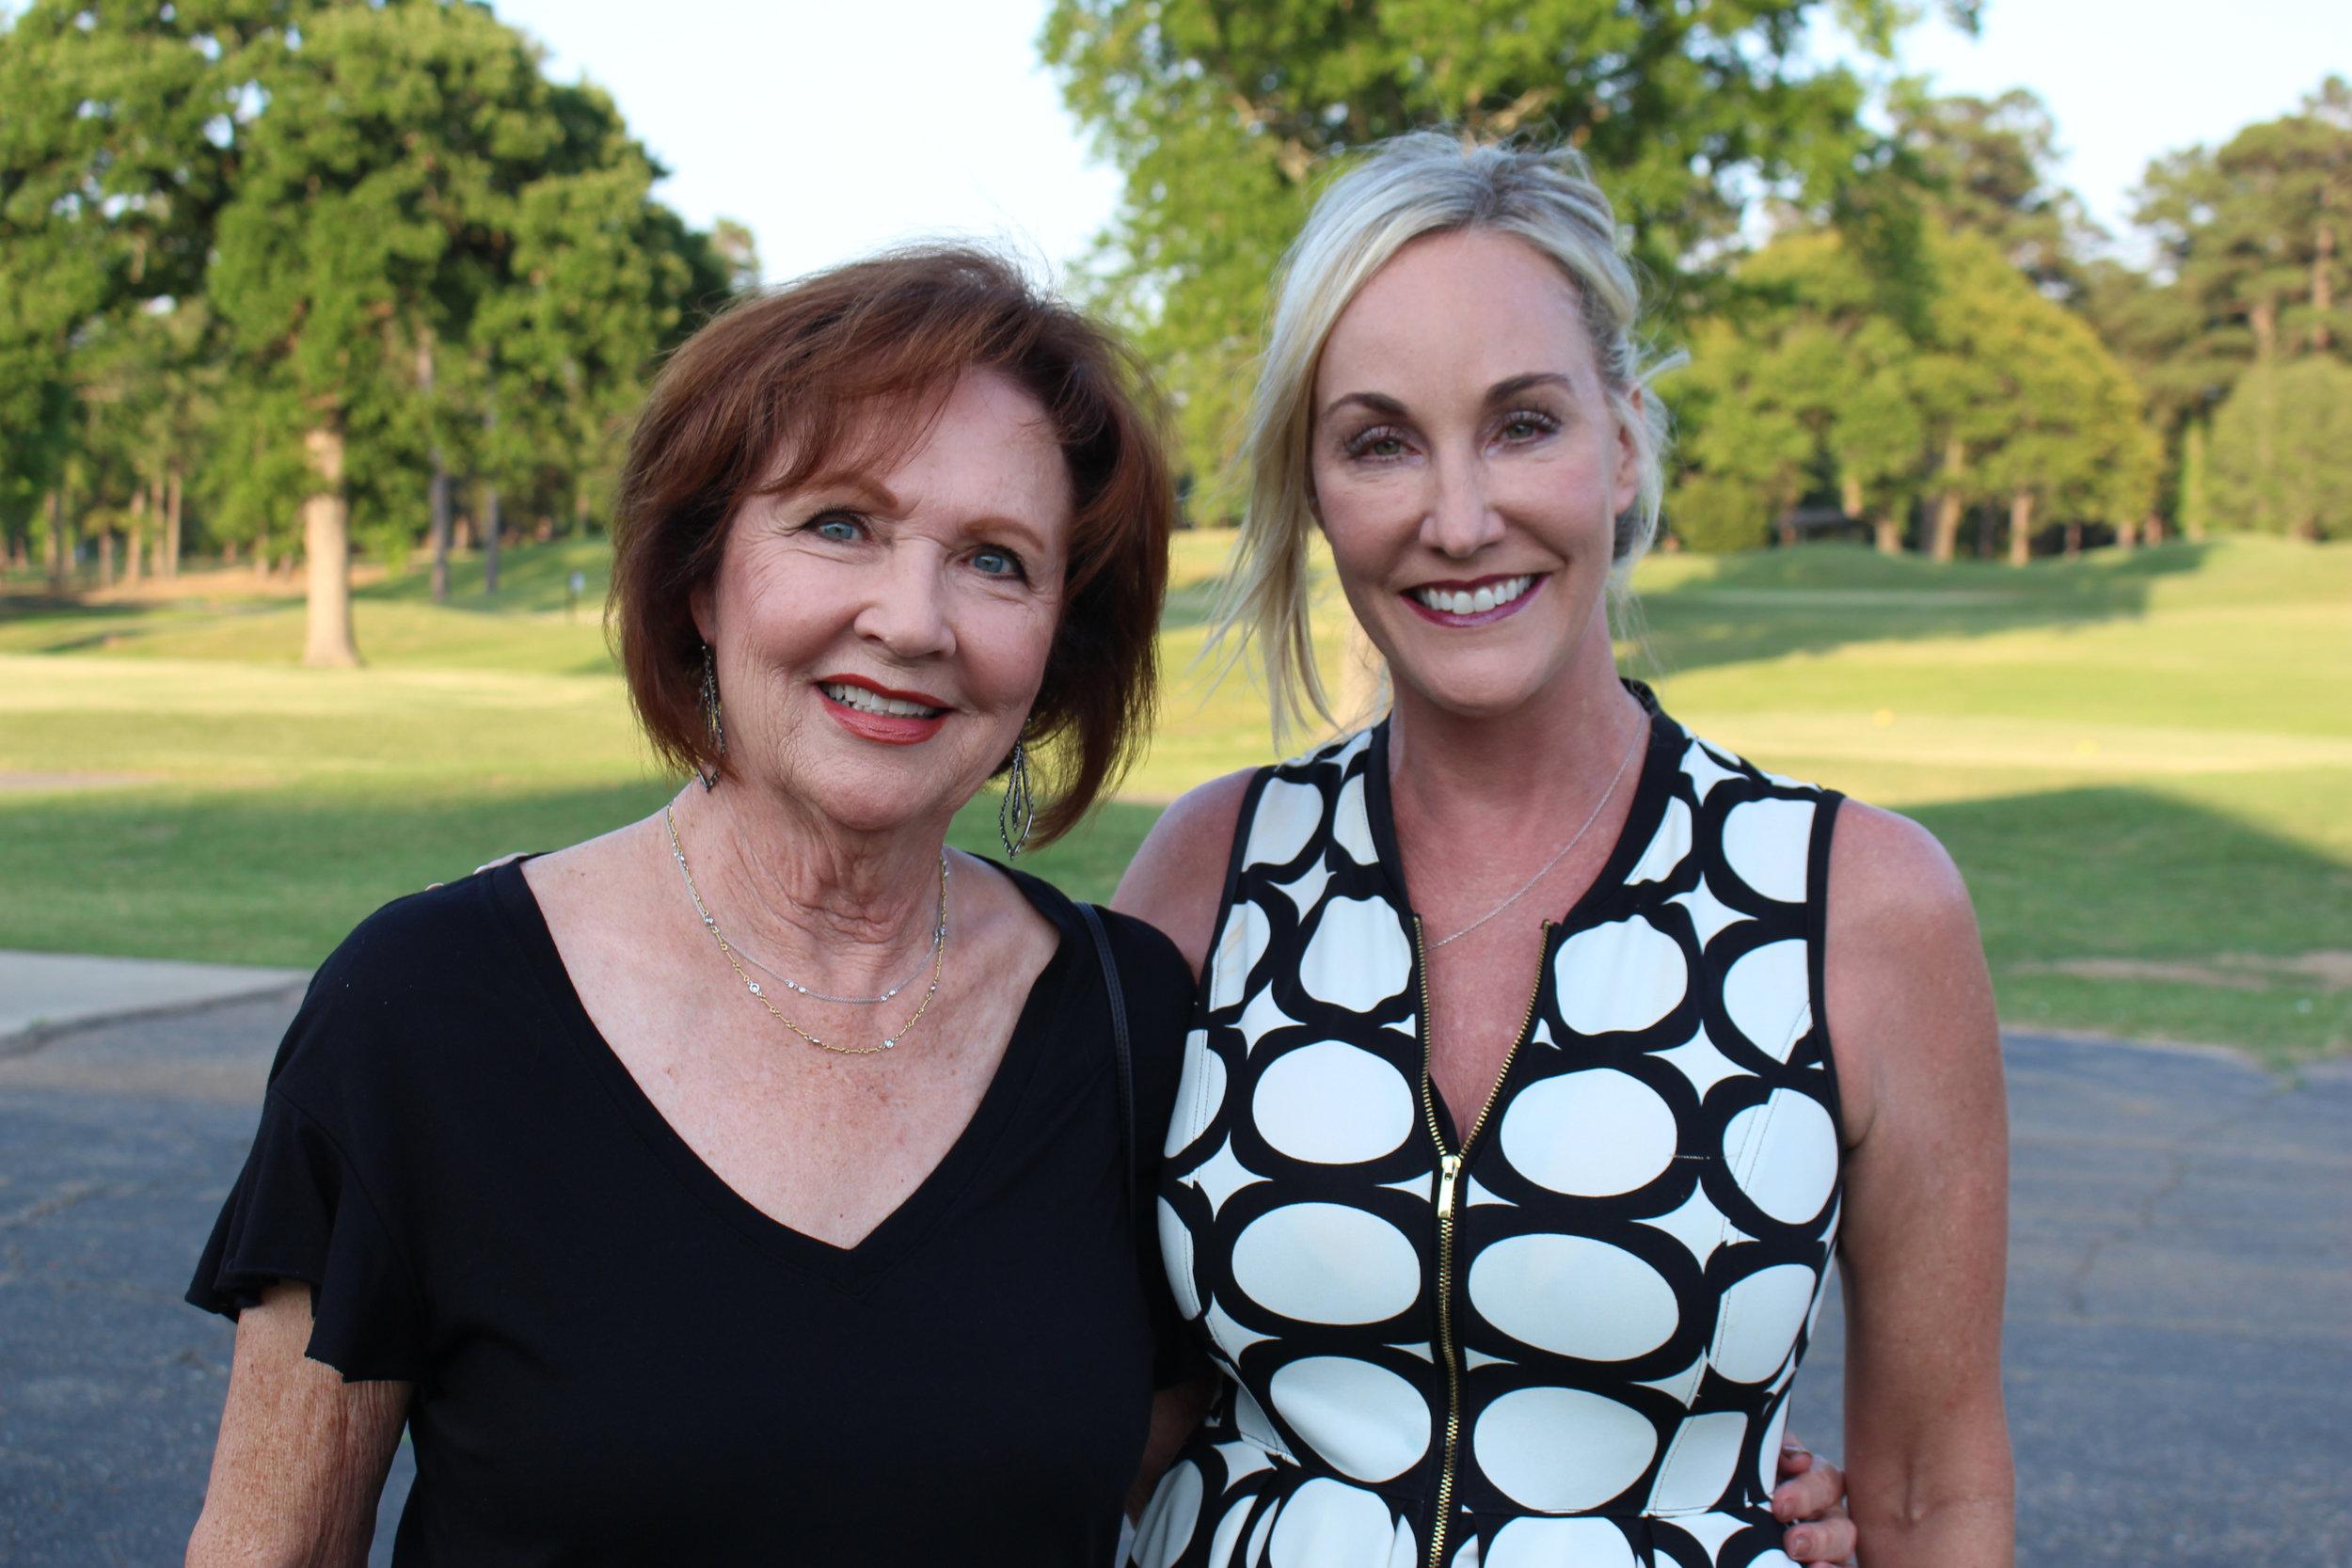 FaEllen Yates and Julie Sinha